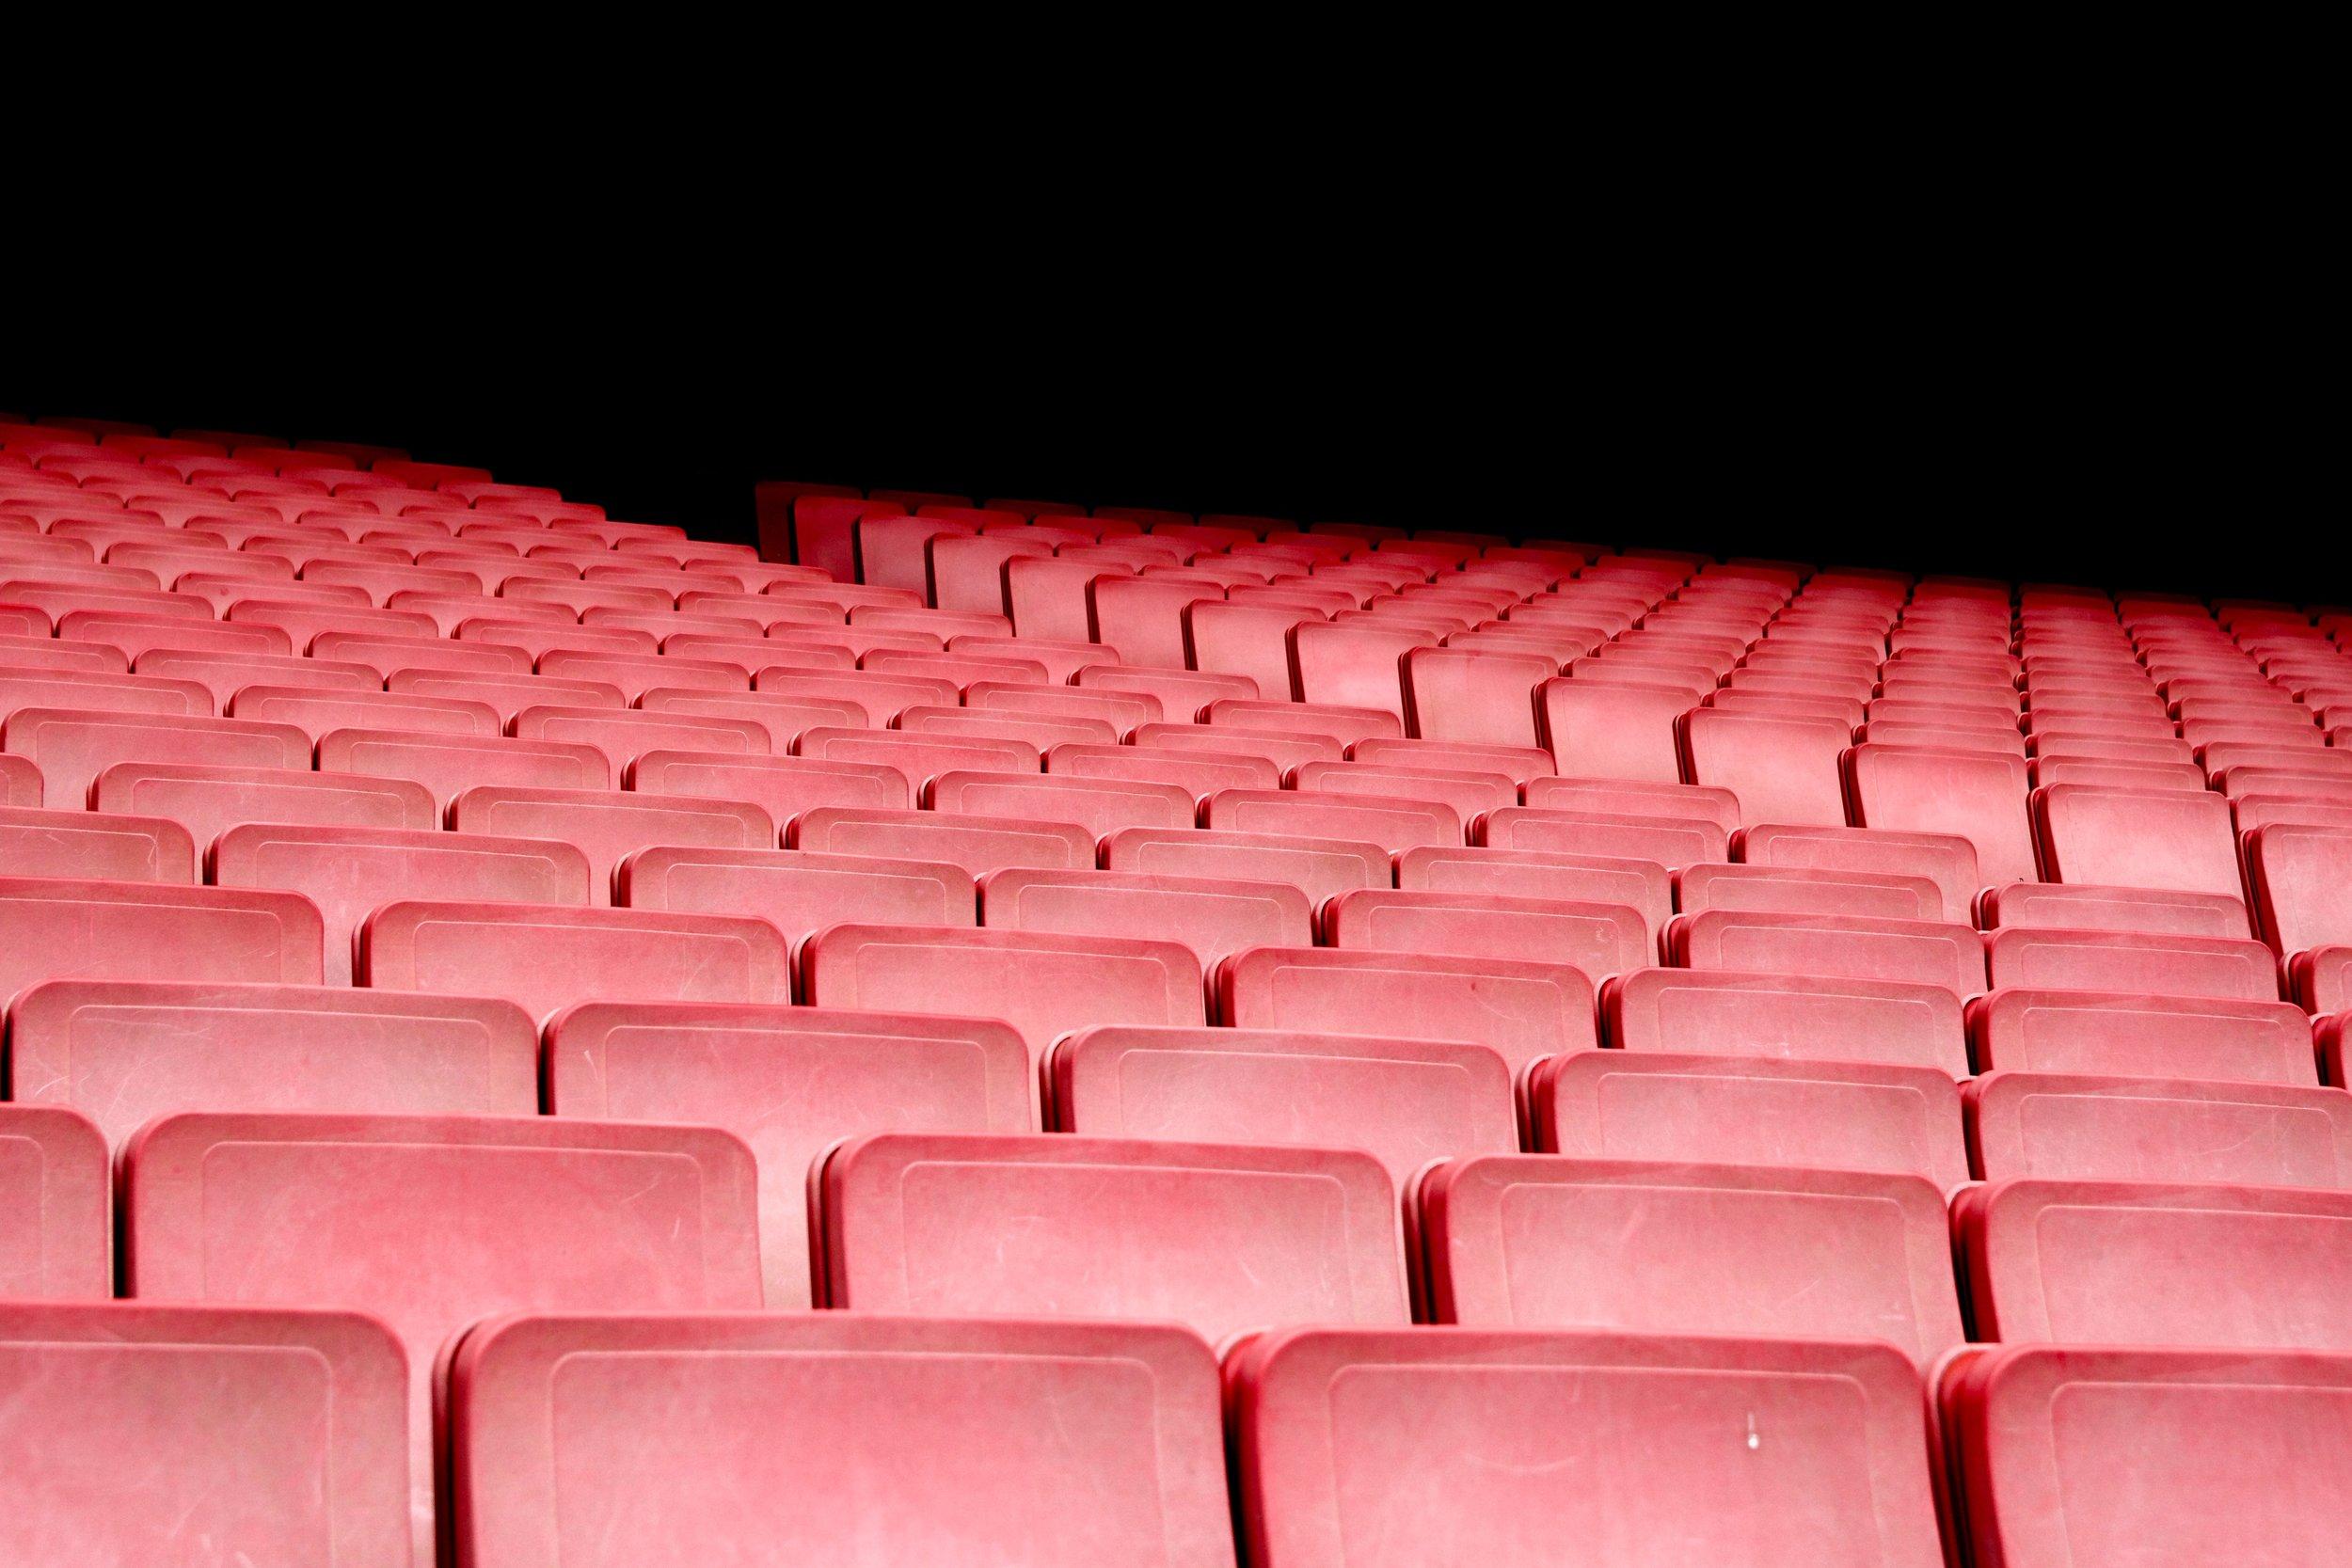 audience-auditorium-bleachers-391535.jpg